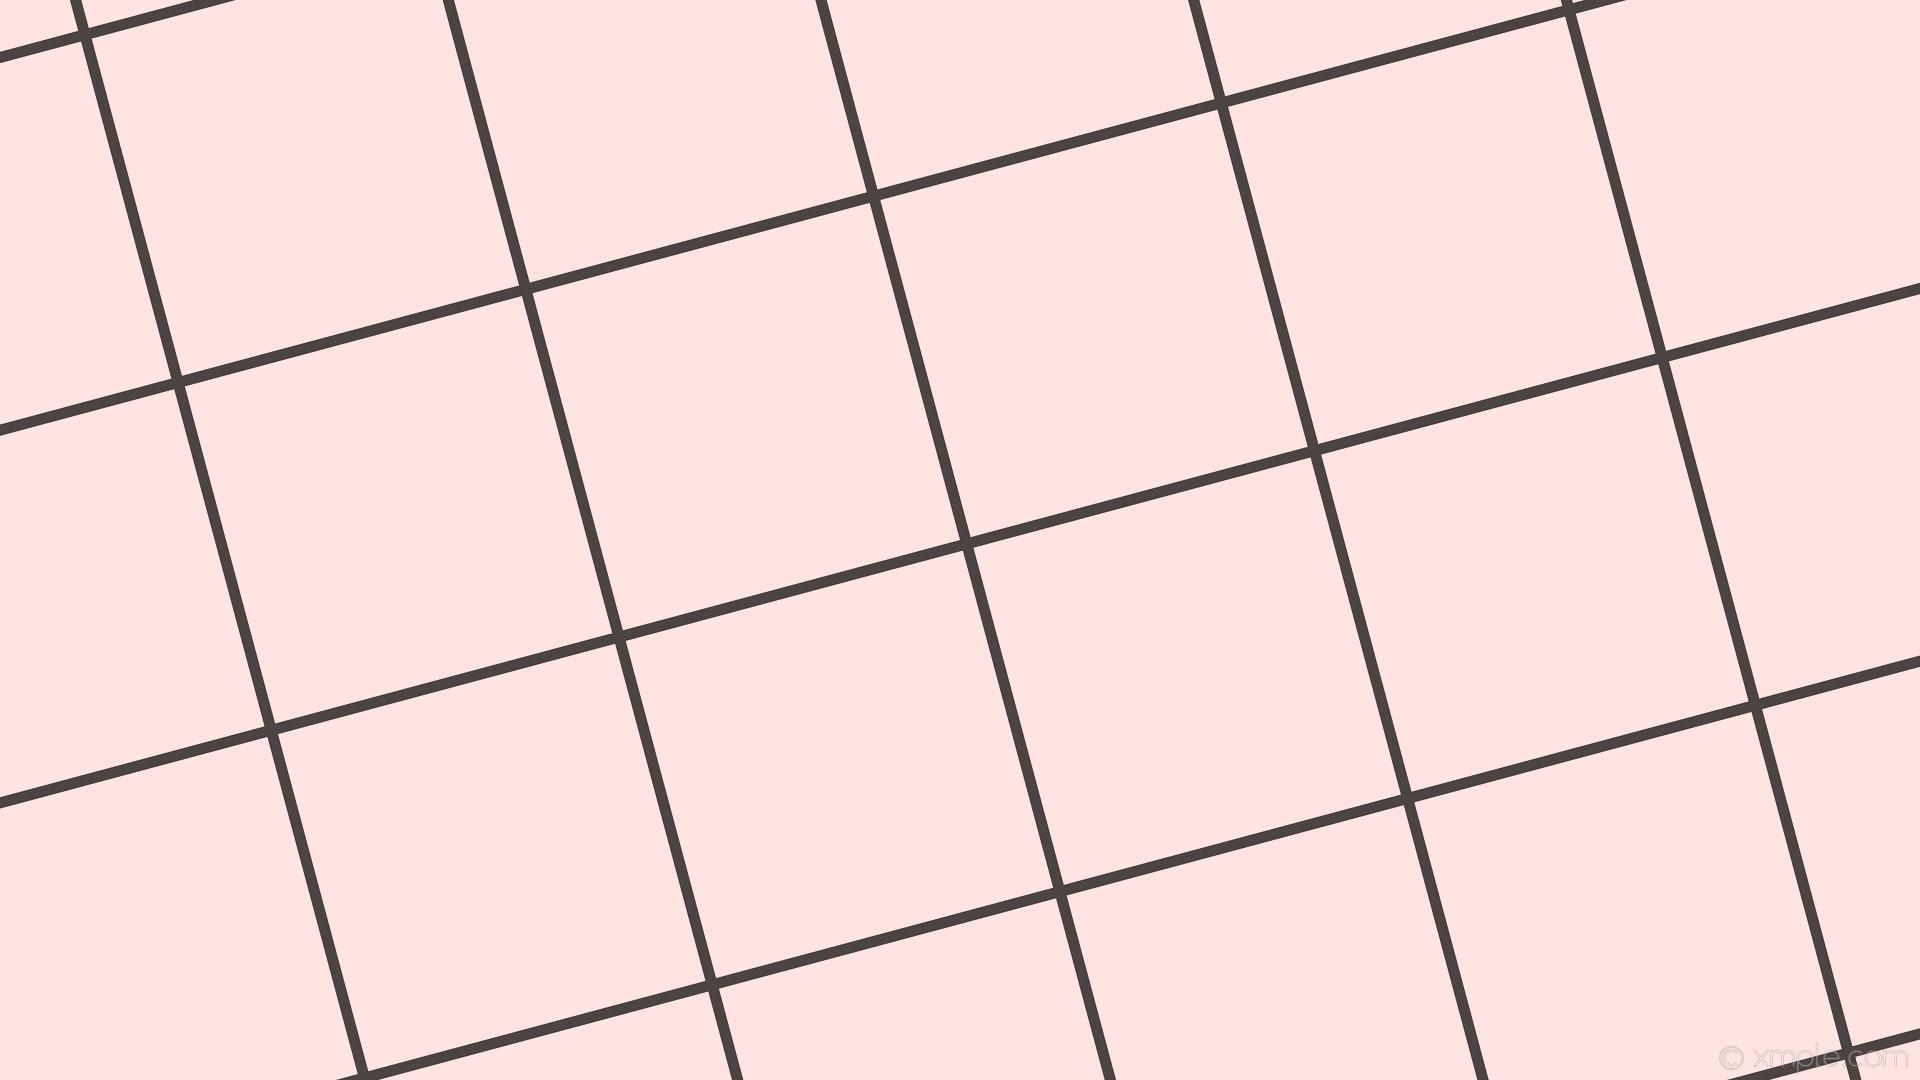 wallpaper graph paper grid black white misty rose #ffe4e1 #000000 15° 11px  360px